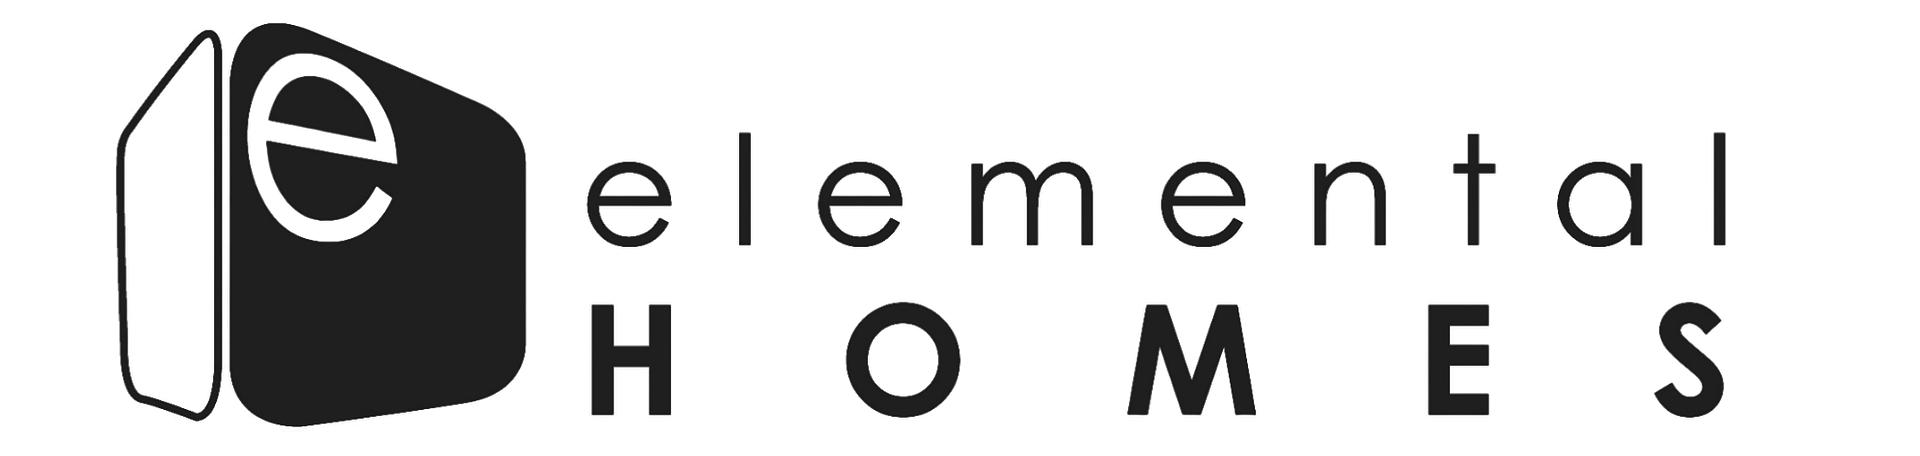 Elemental Homes